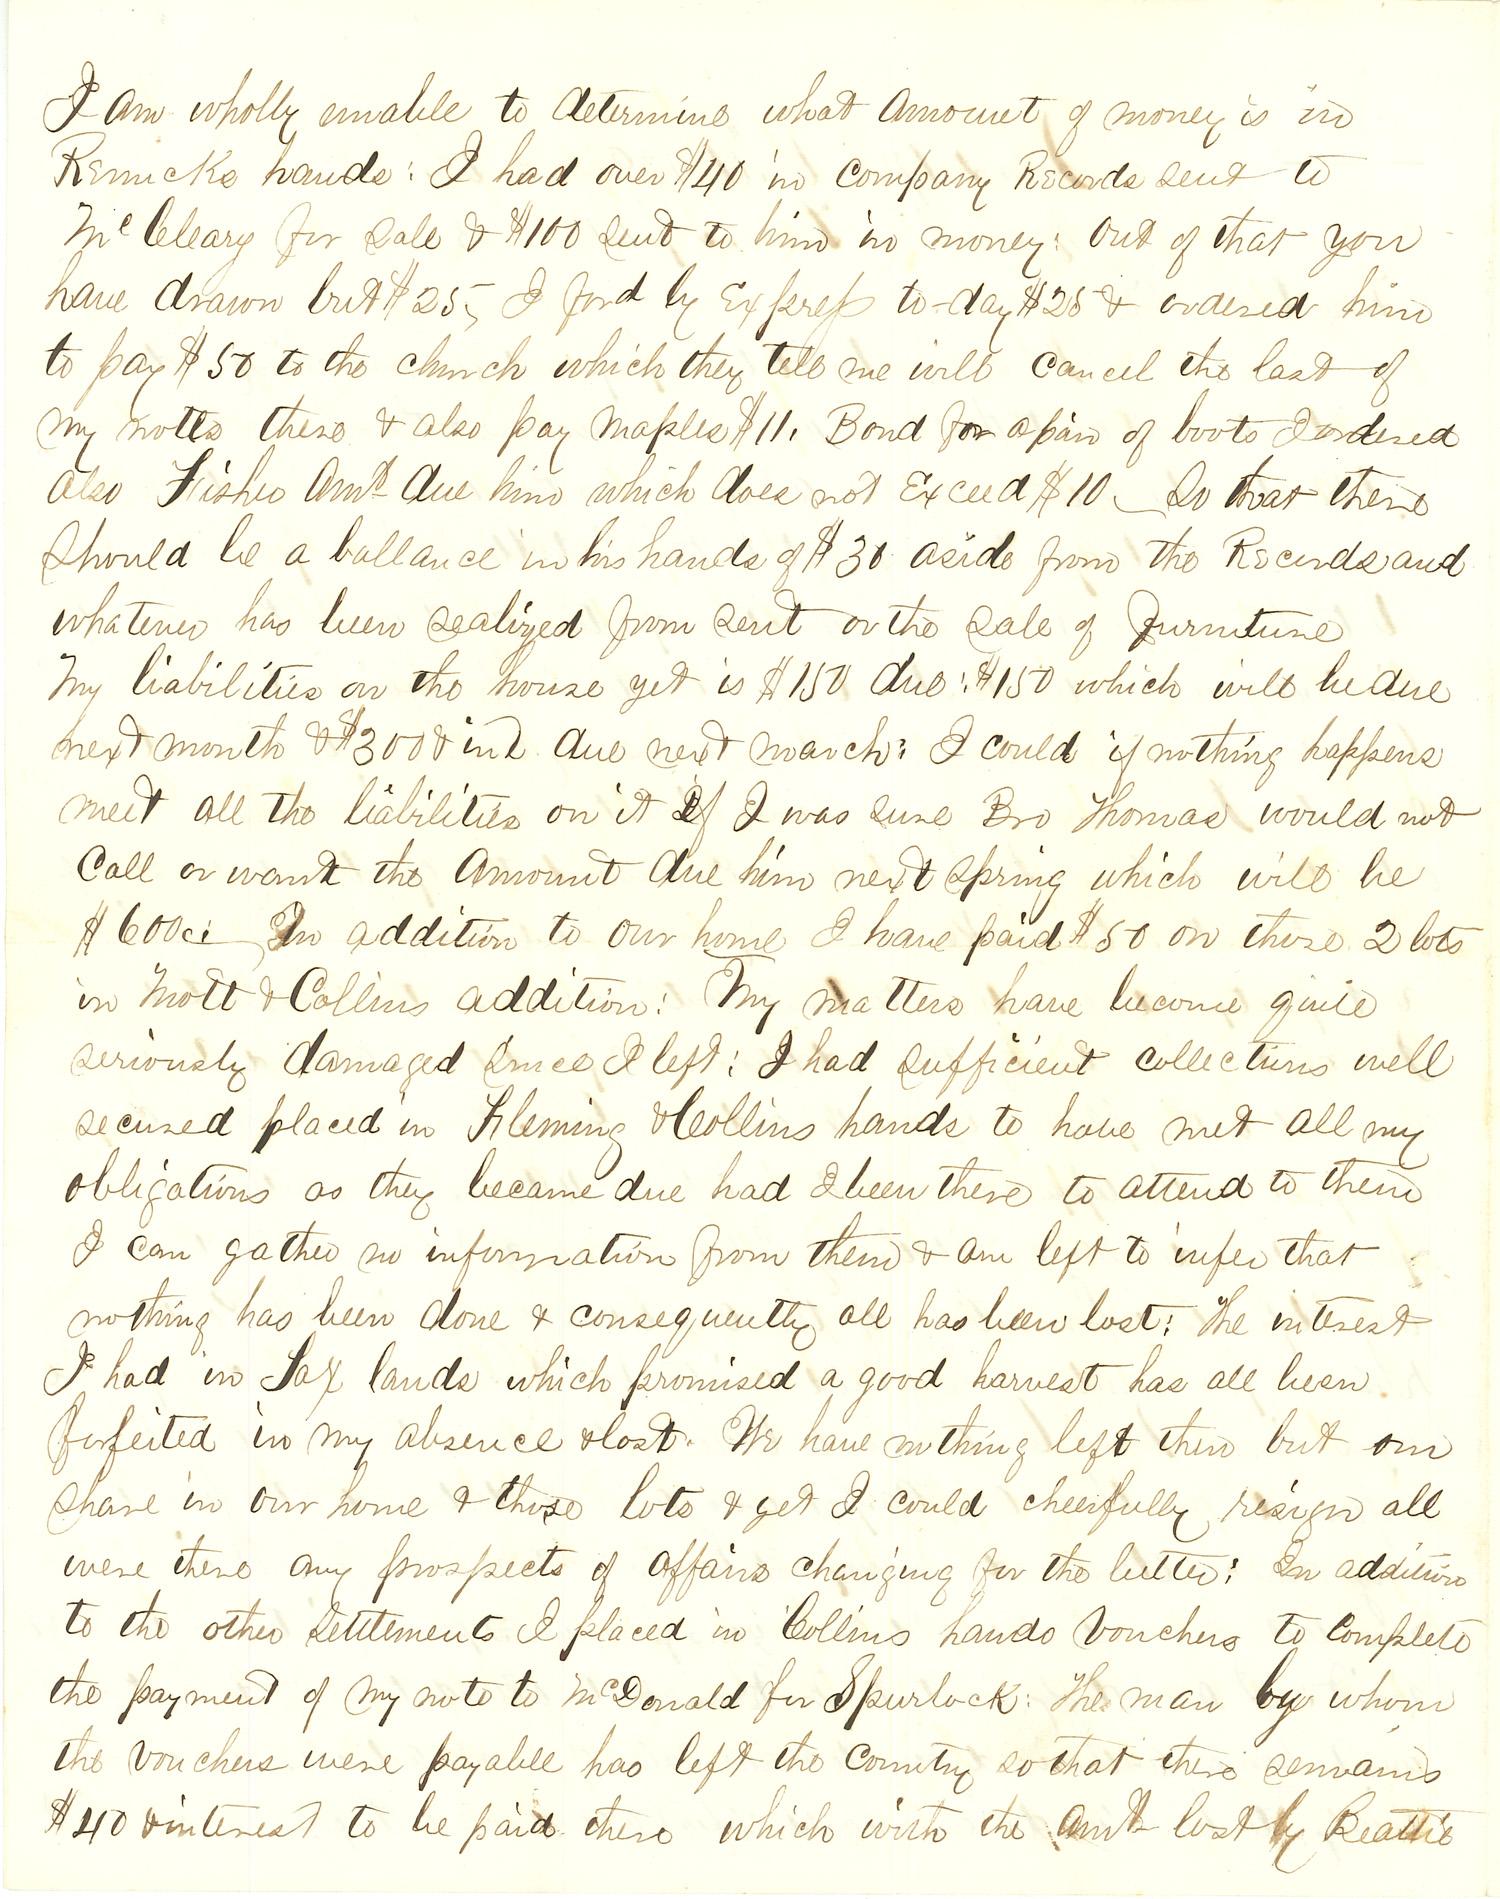 Joseph Culver Letter, September 19, 1863, Page 2